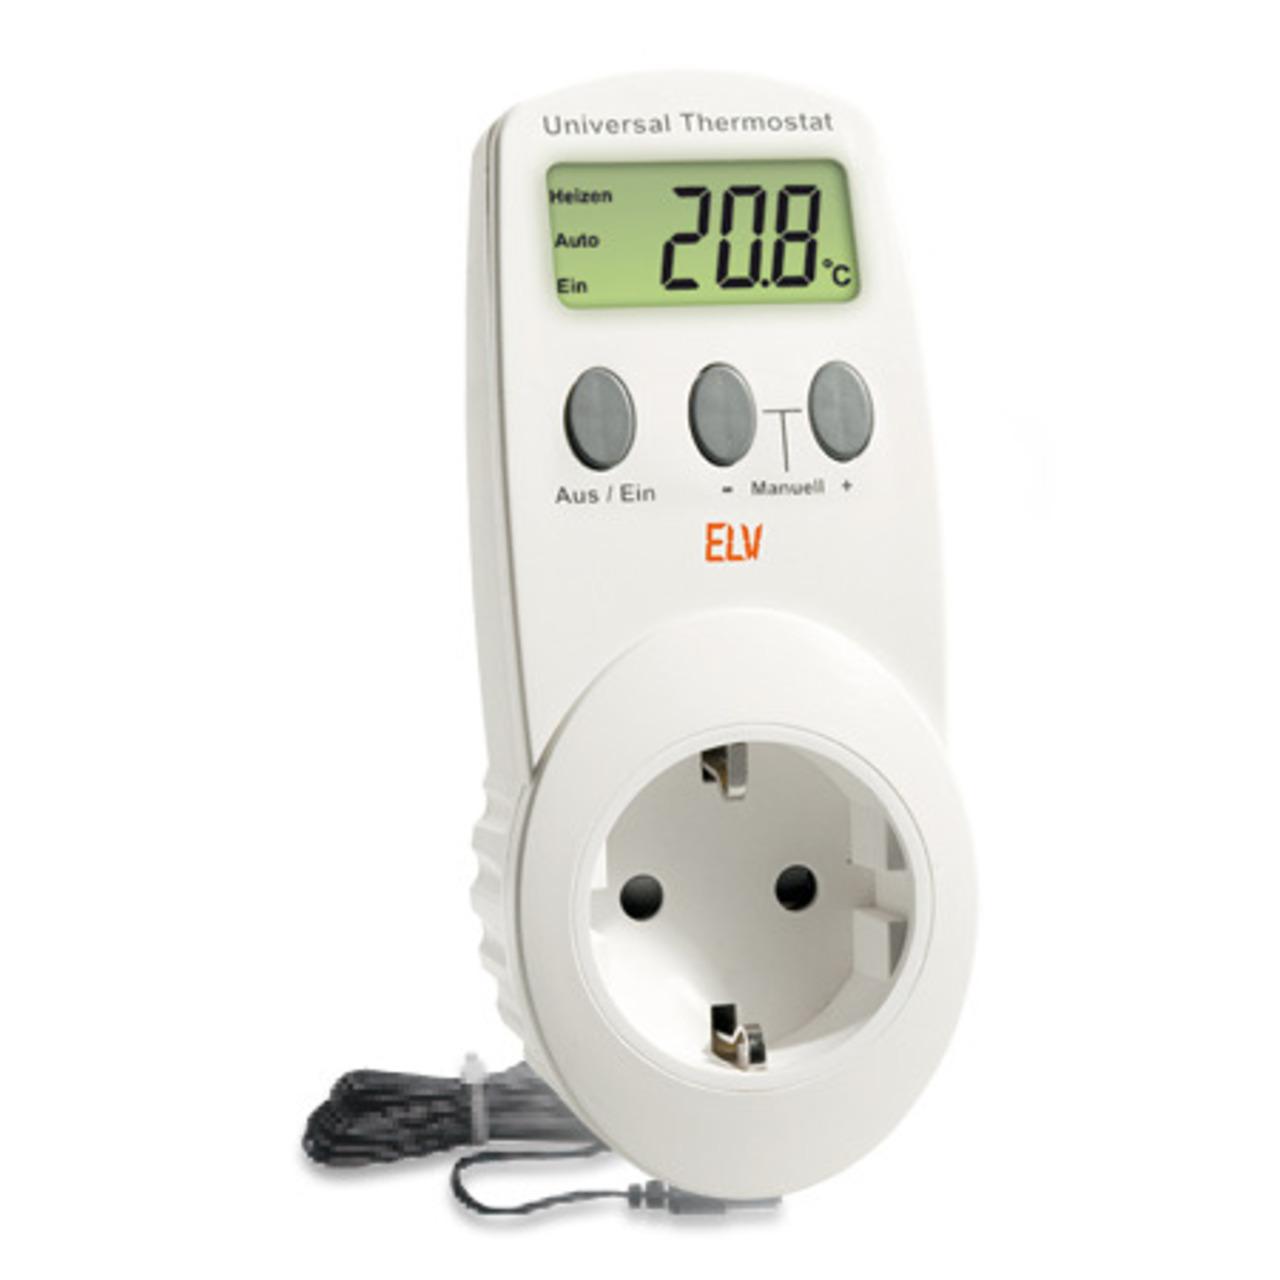 ELV Bausatz Universal Thermostat UT 200-2